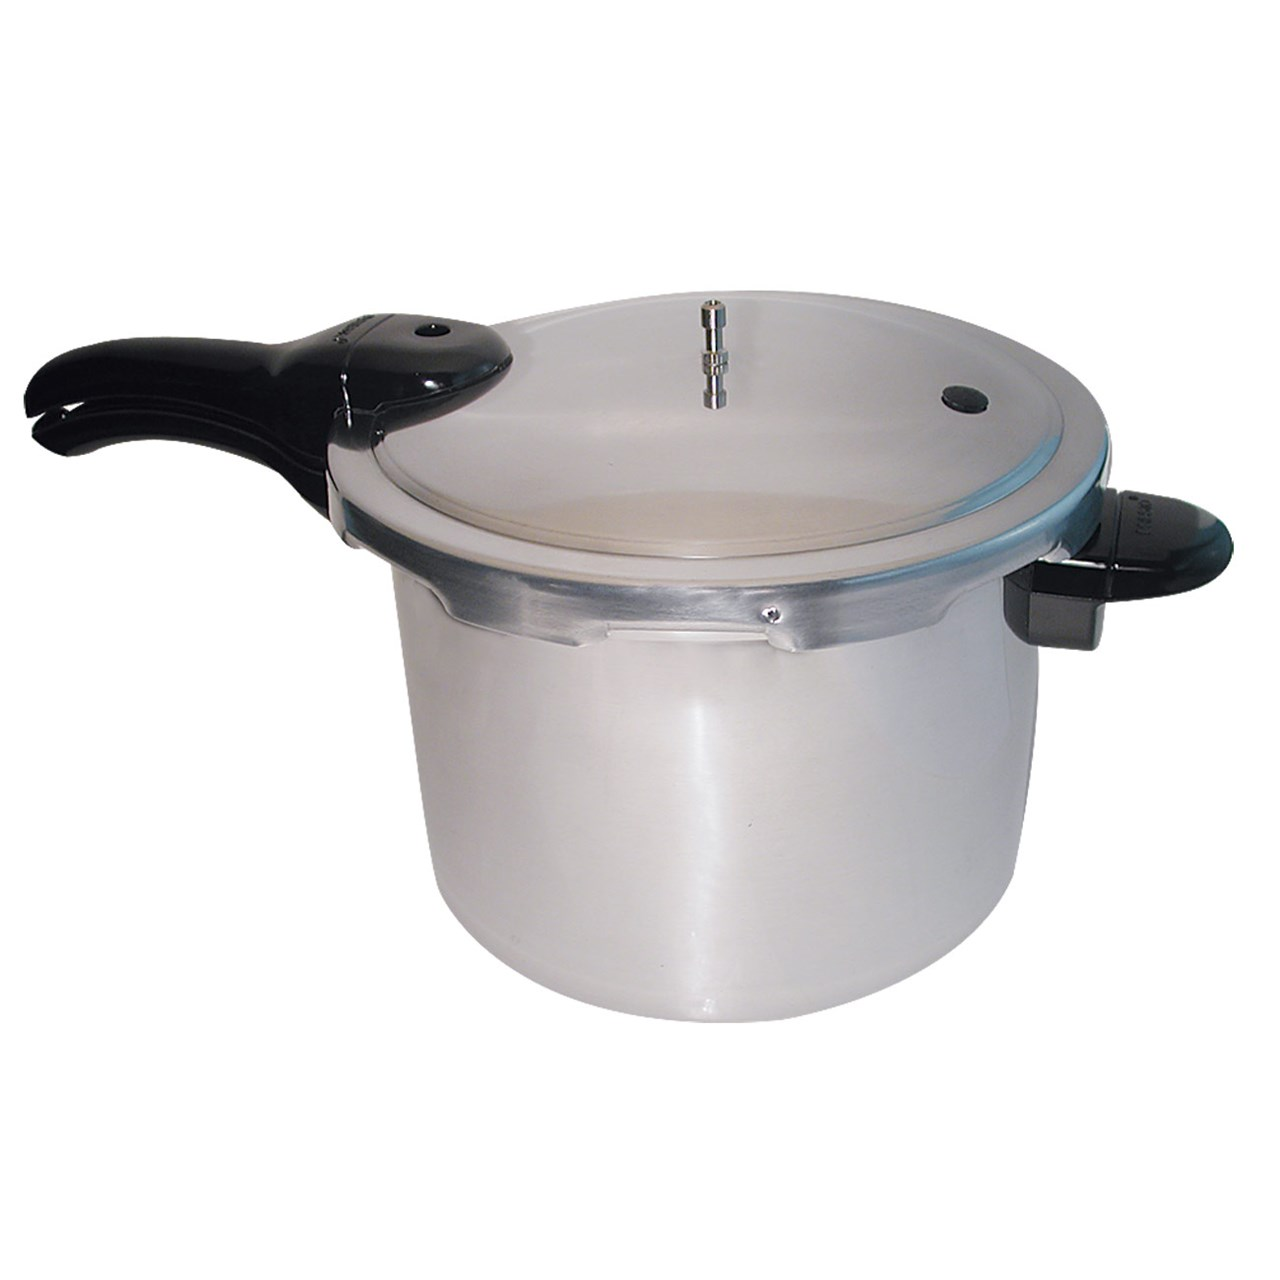 Maxiaids Presto Pressure Cooker 4 Quart